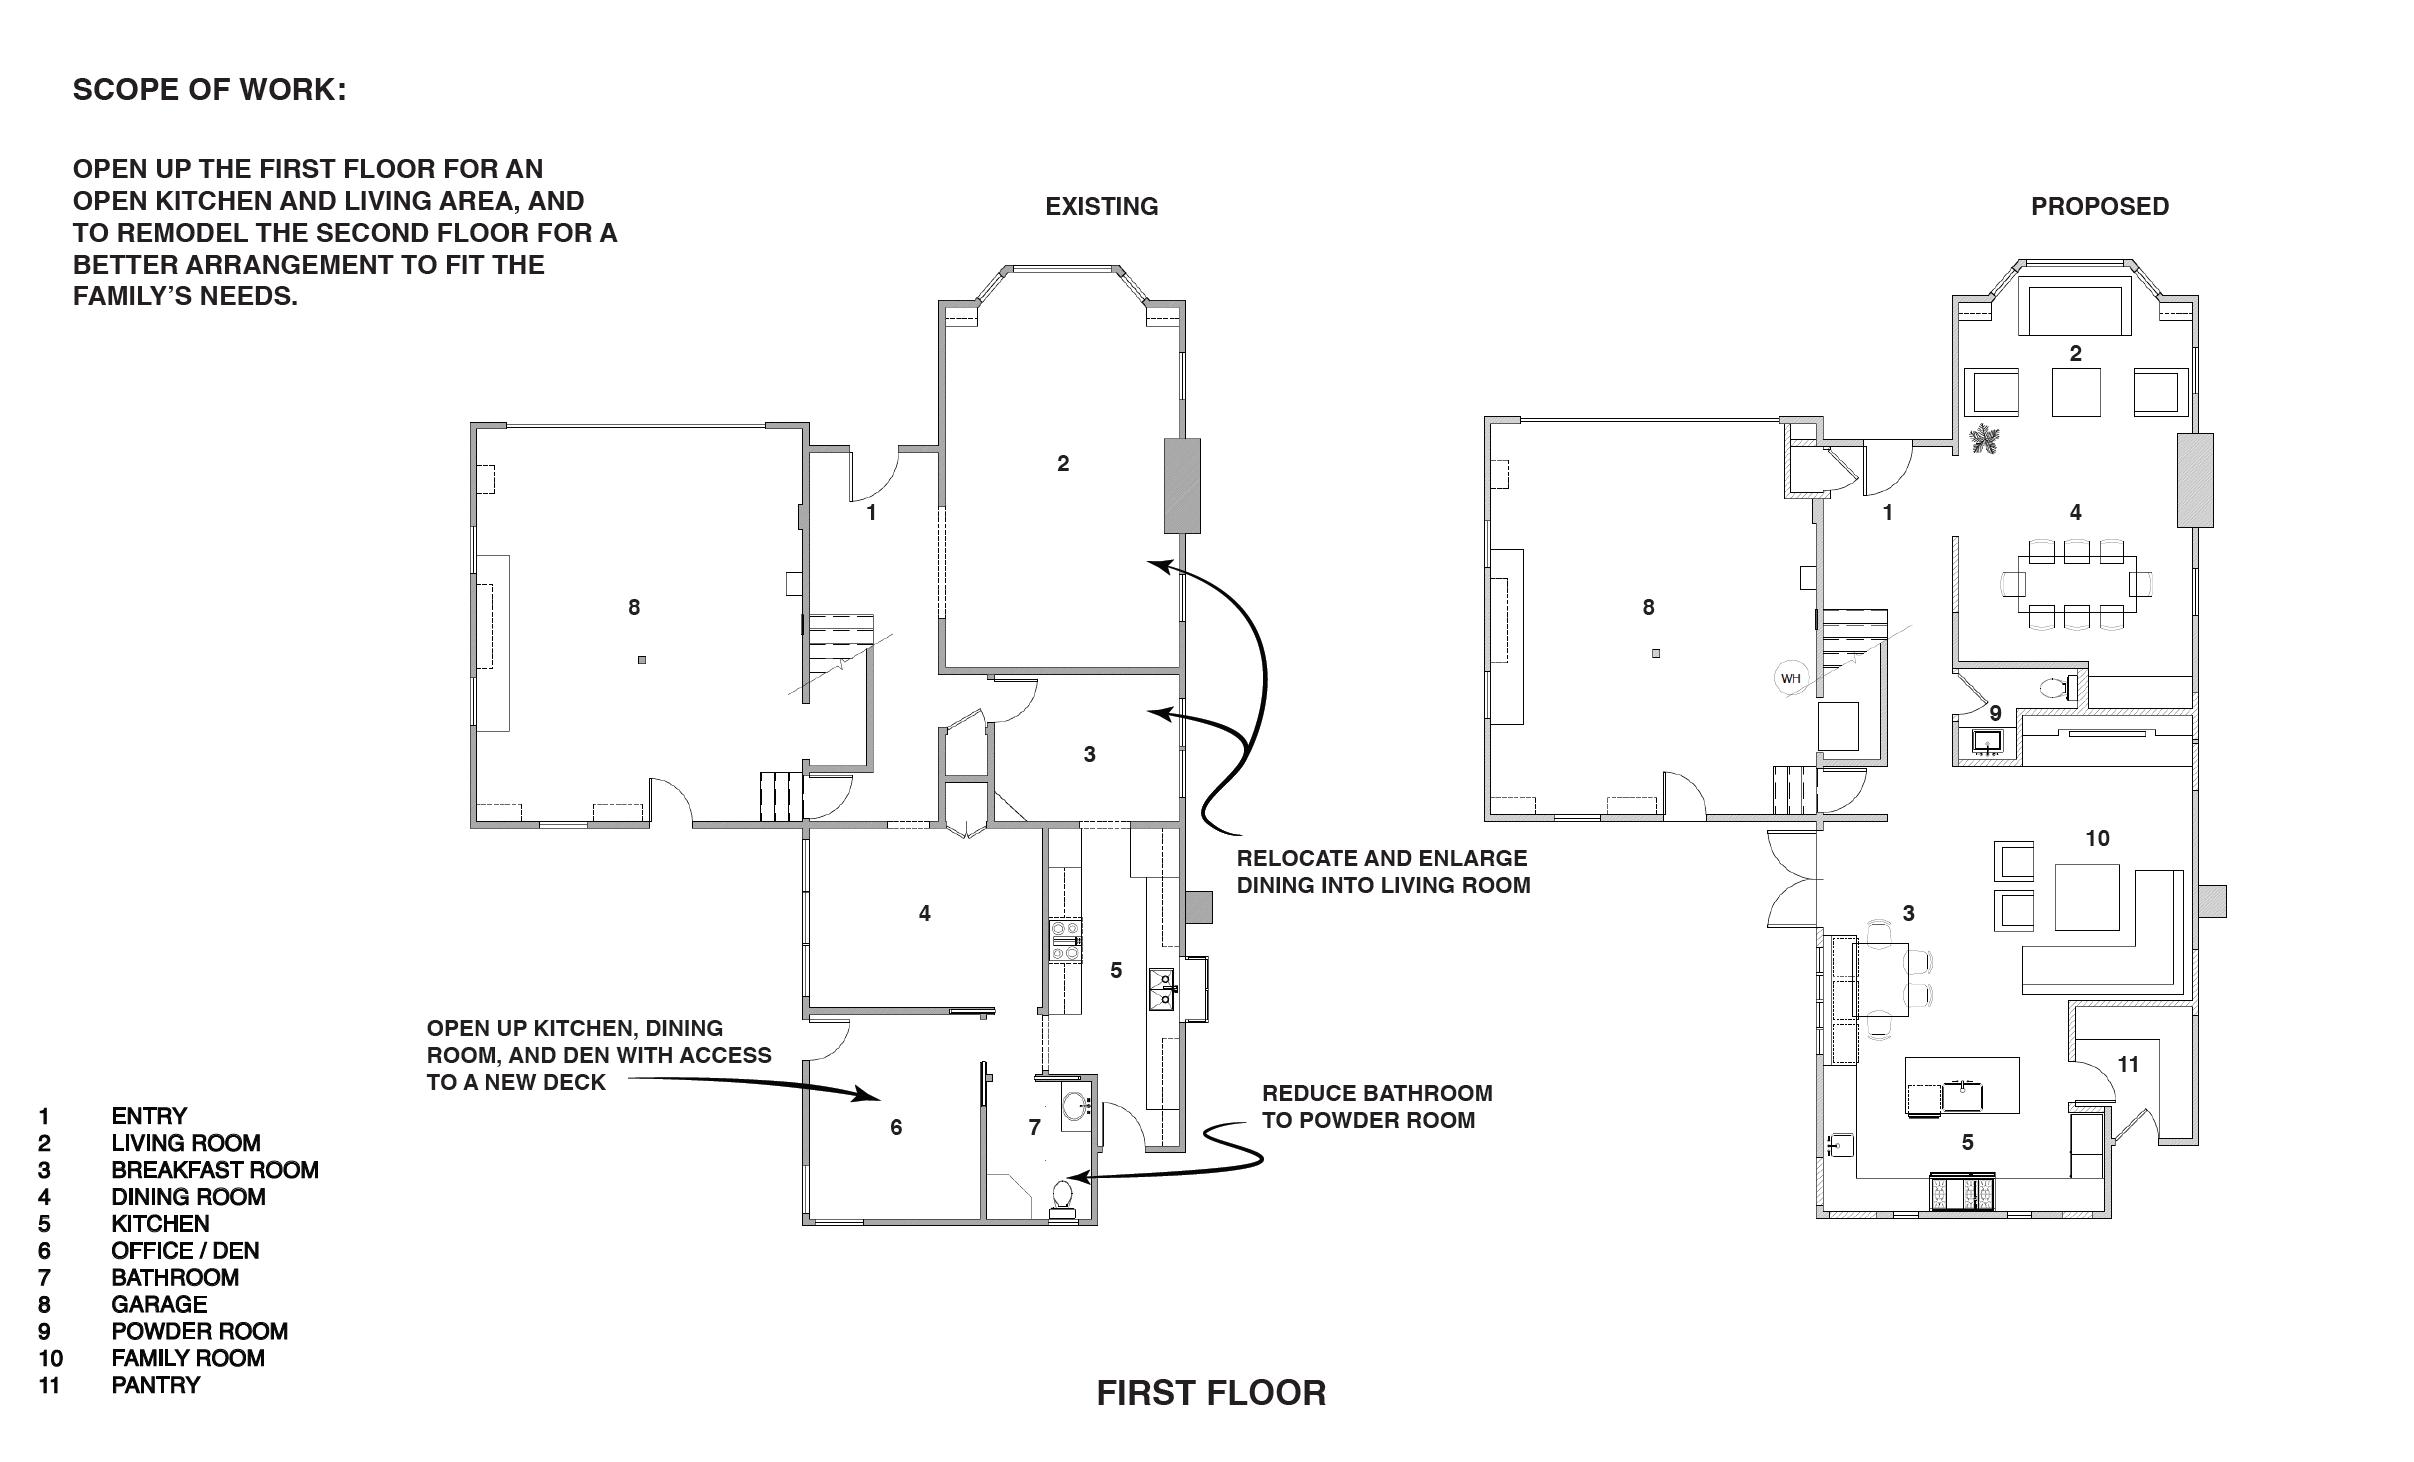 Final_First Floor.png